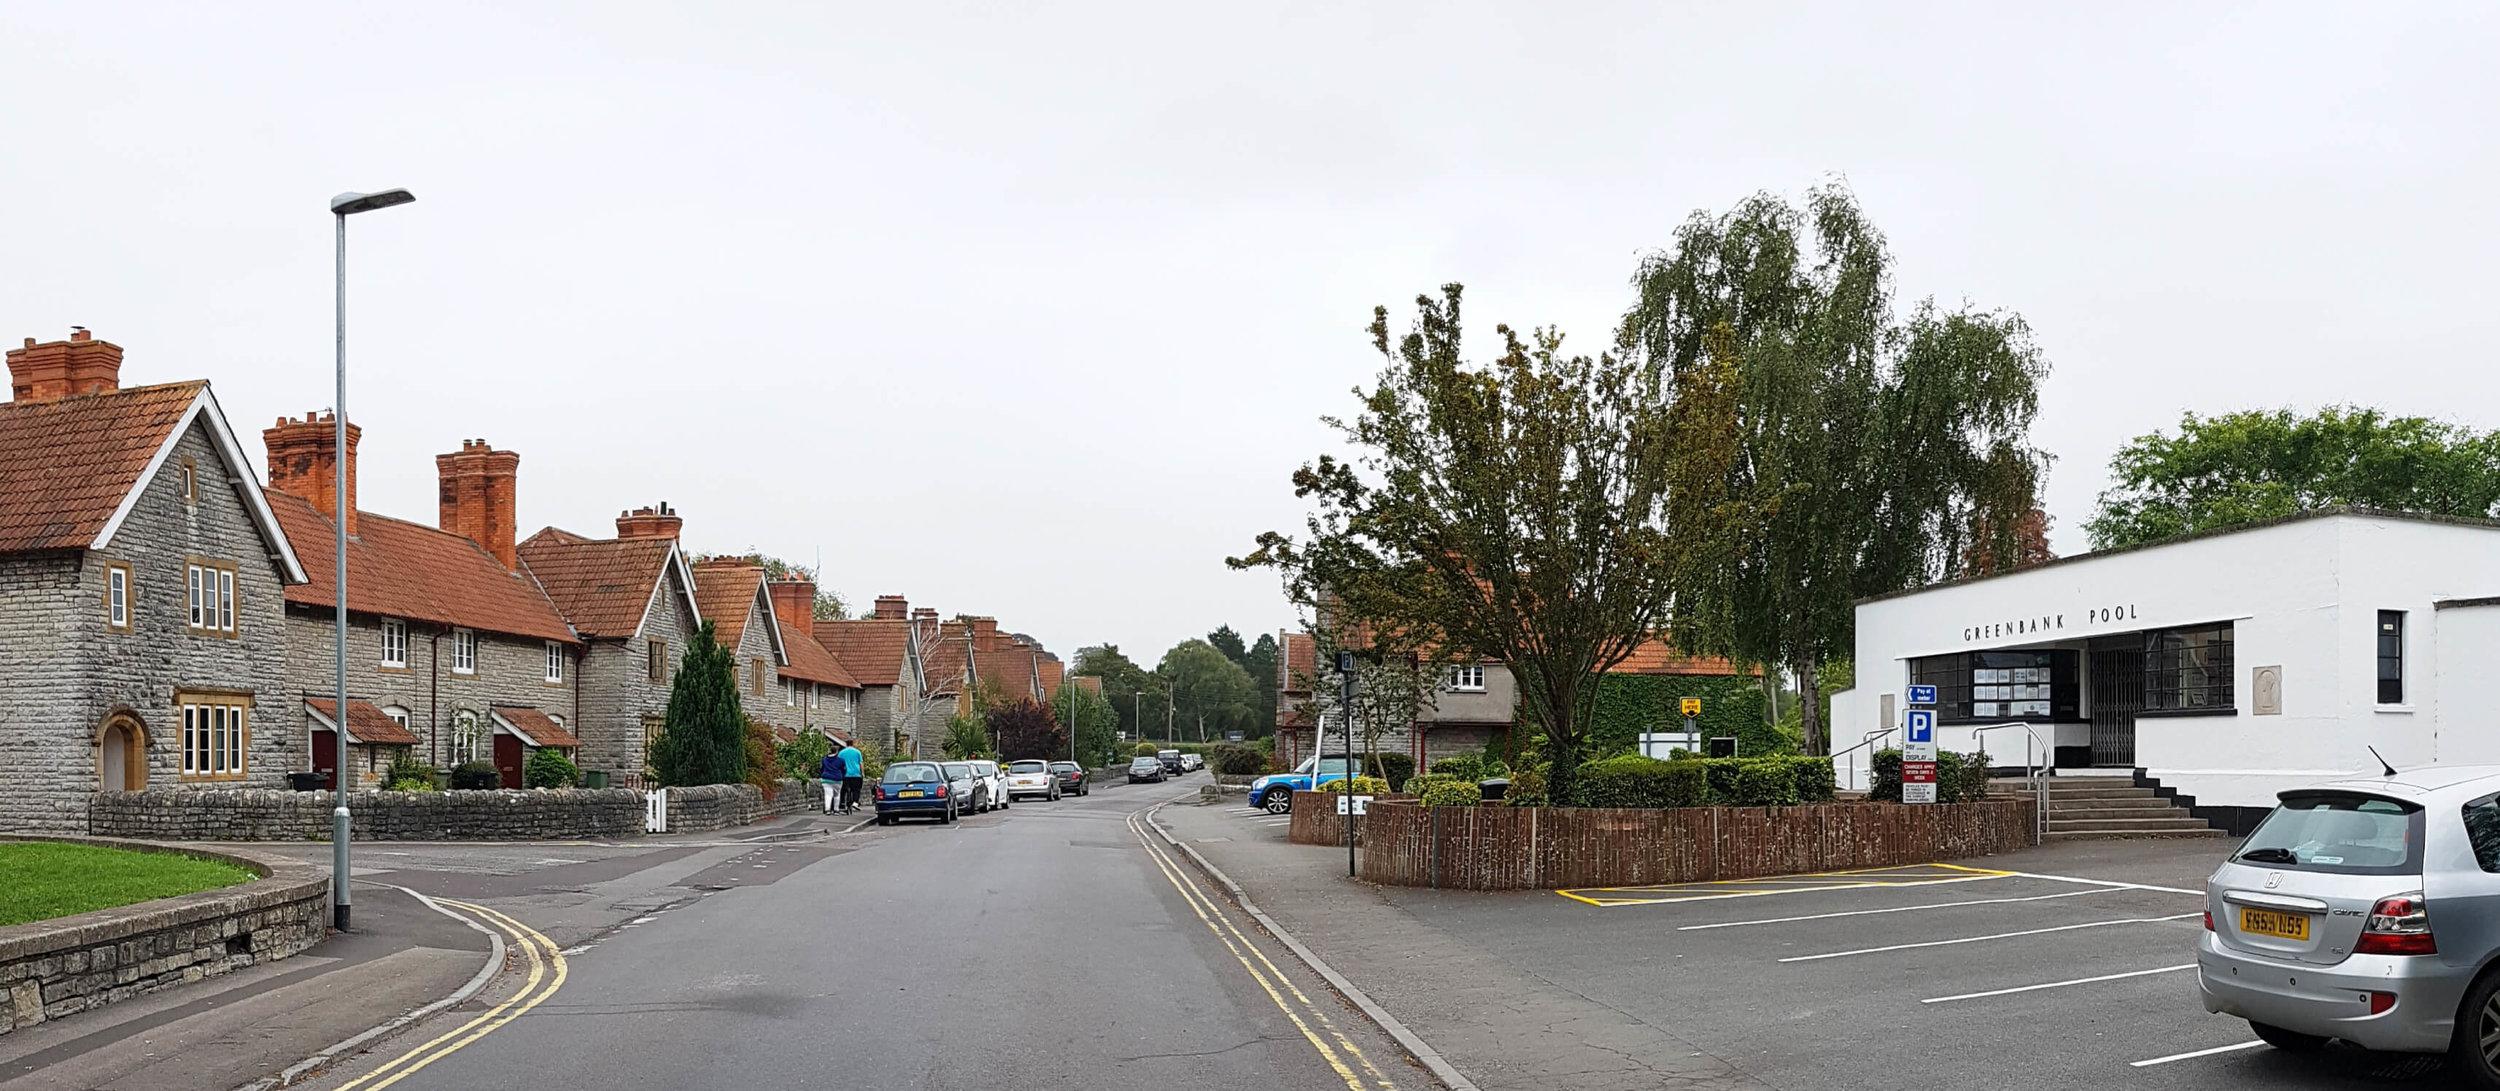 Street-Somerset-Lido-lias-prewett-bizley-architects-clarks.jpg